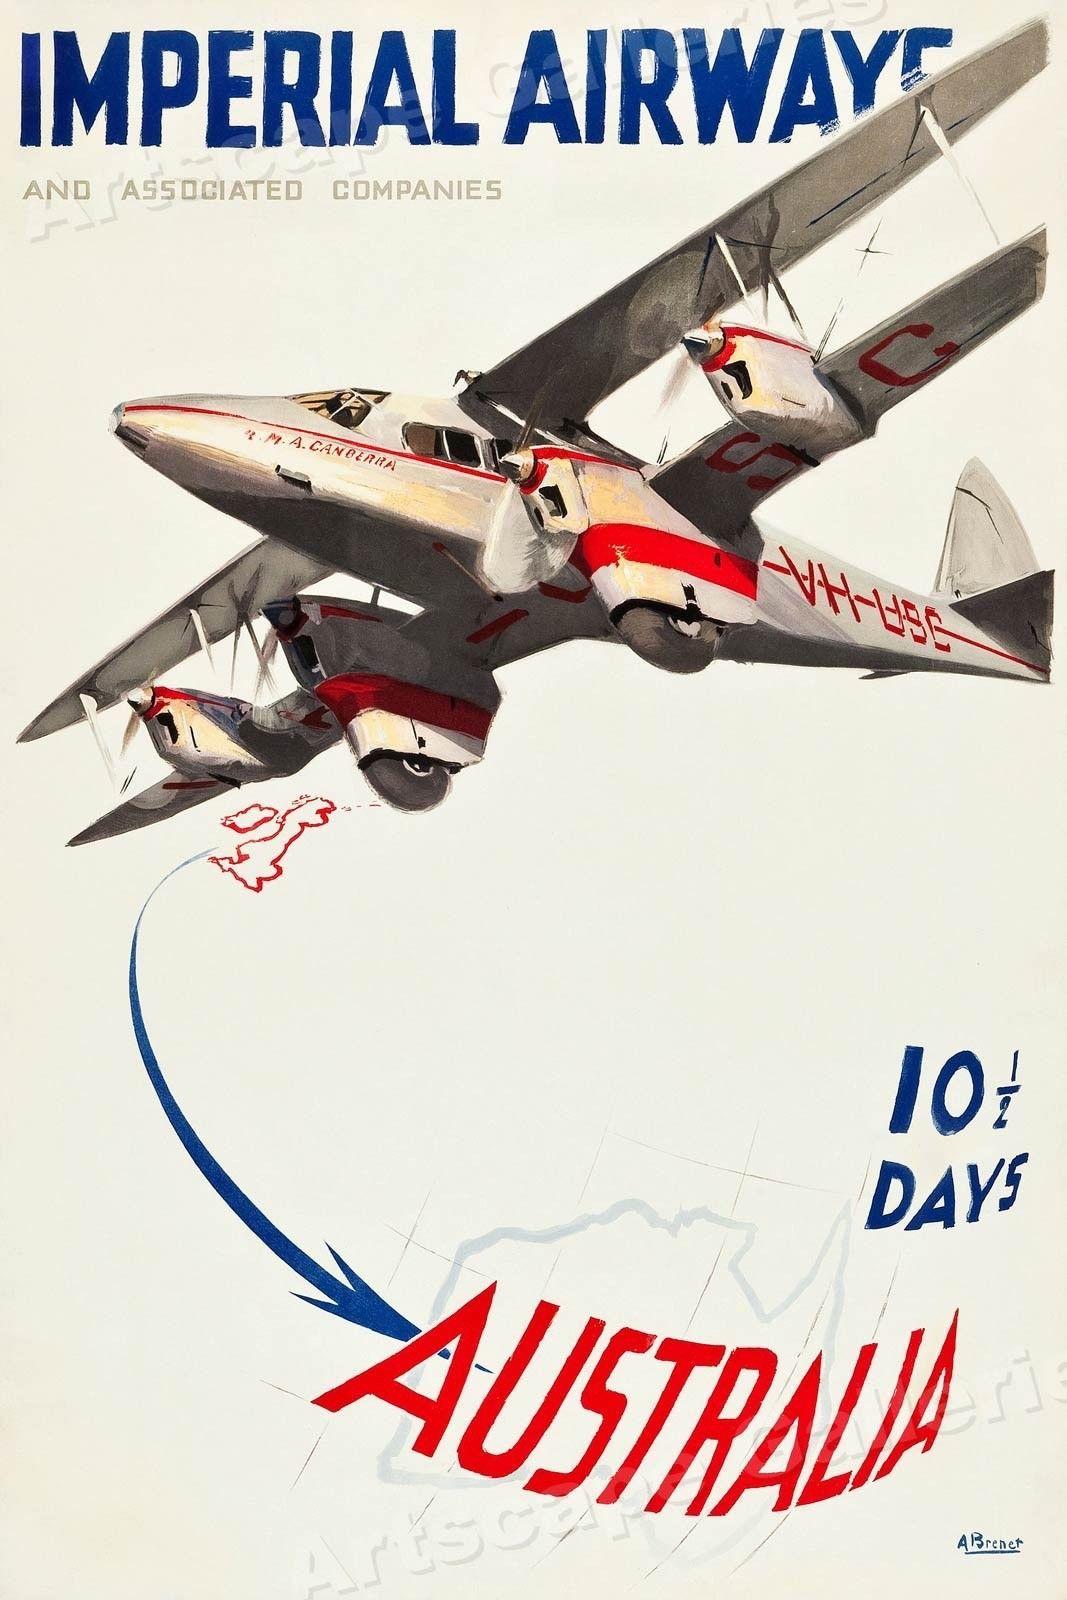 24x36 Imperial Airways 10 ½  Days to Australia 1935 Vintage Travel Poster